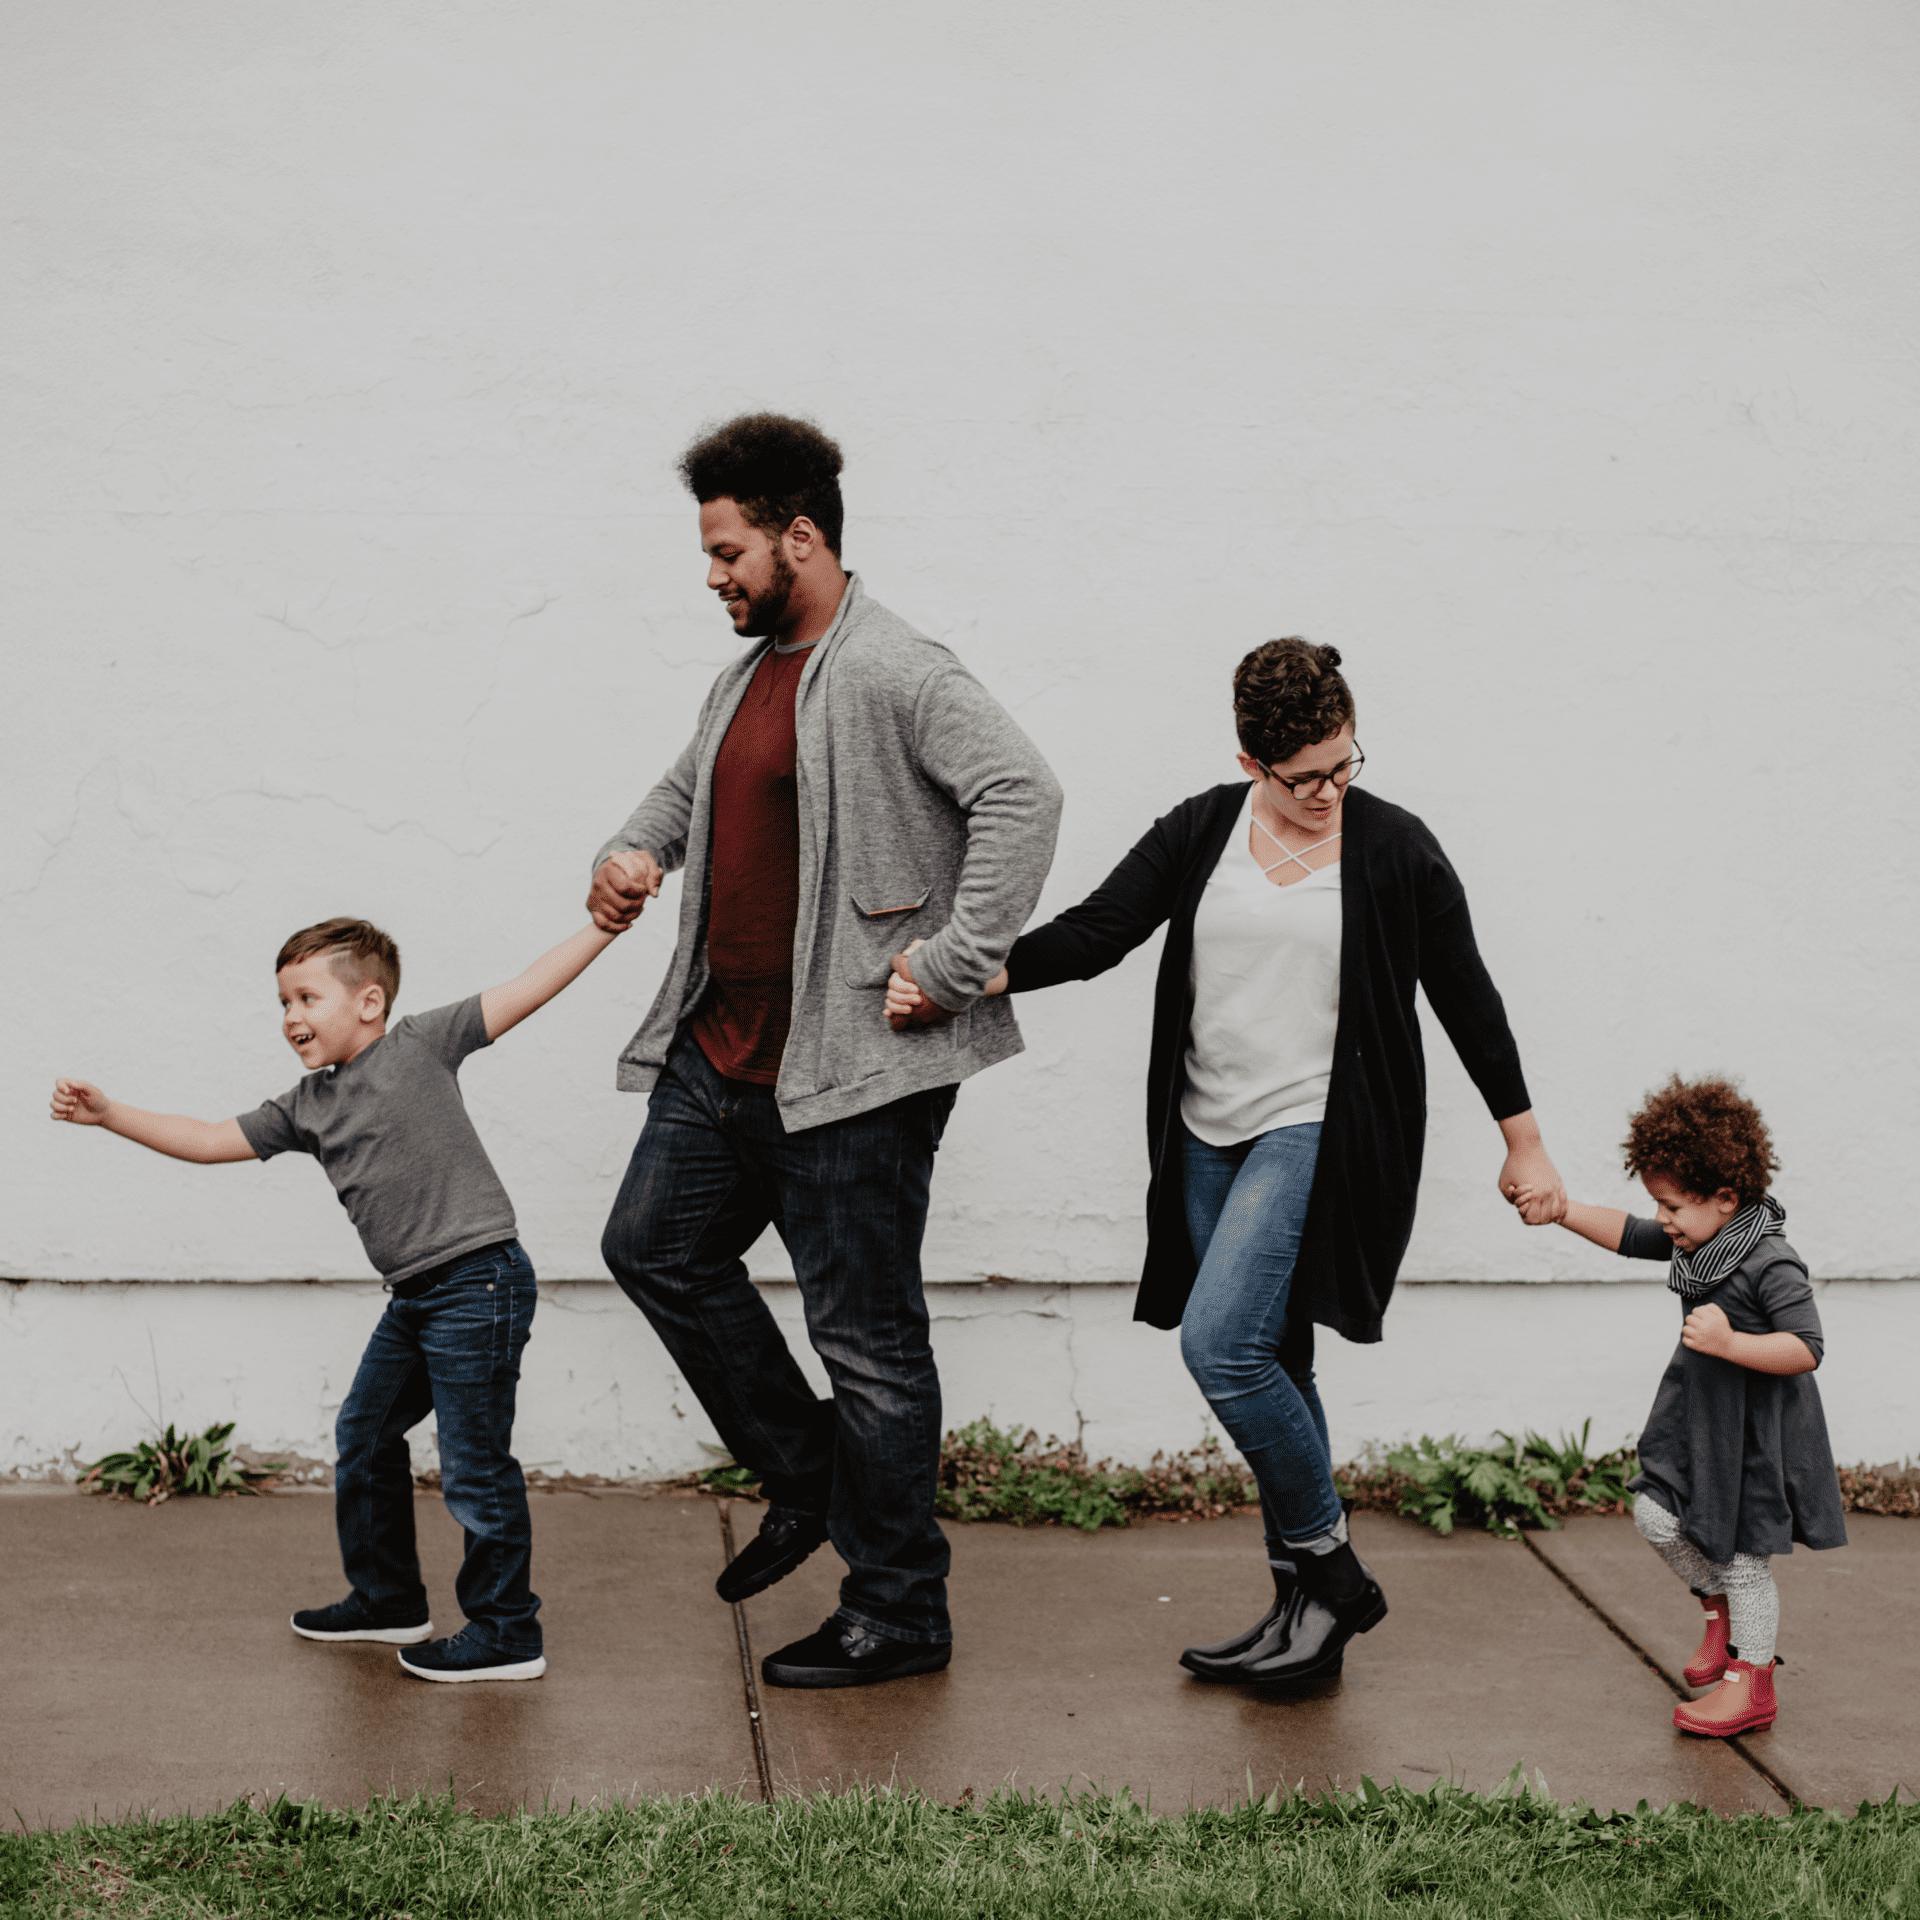 Family walking down the sidewalk